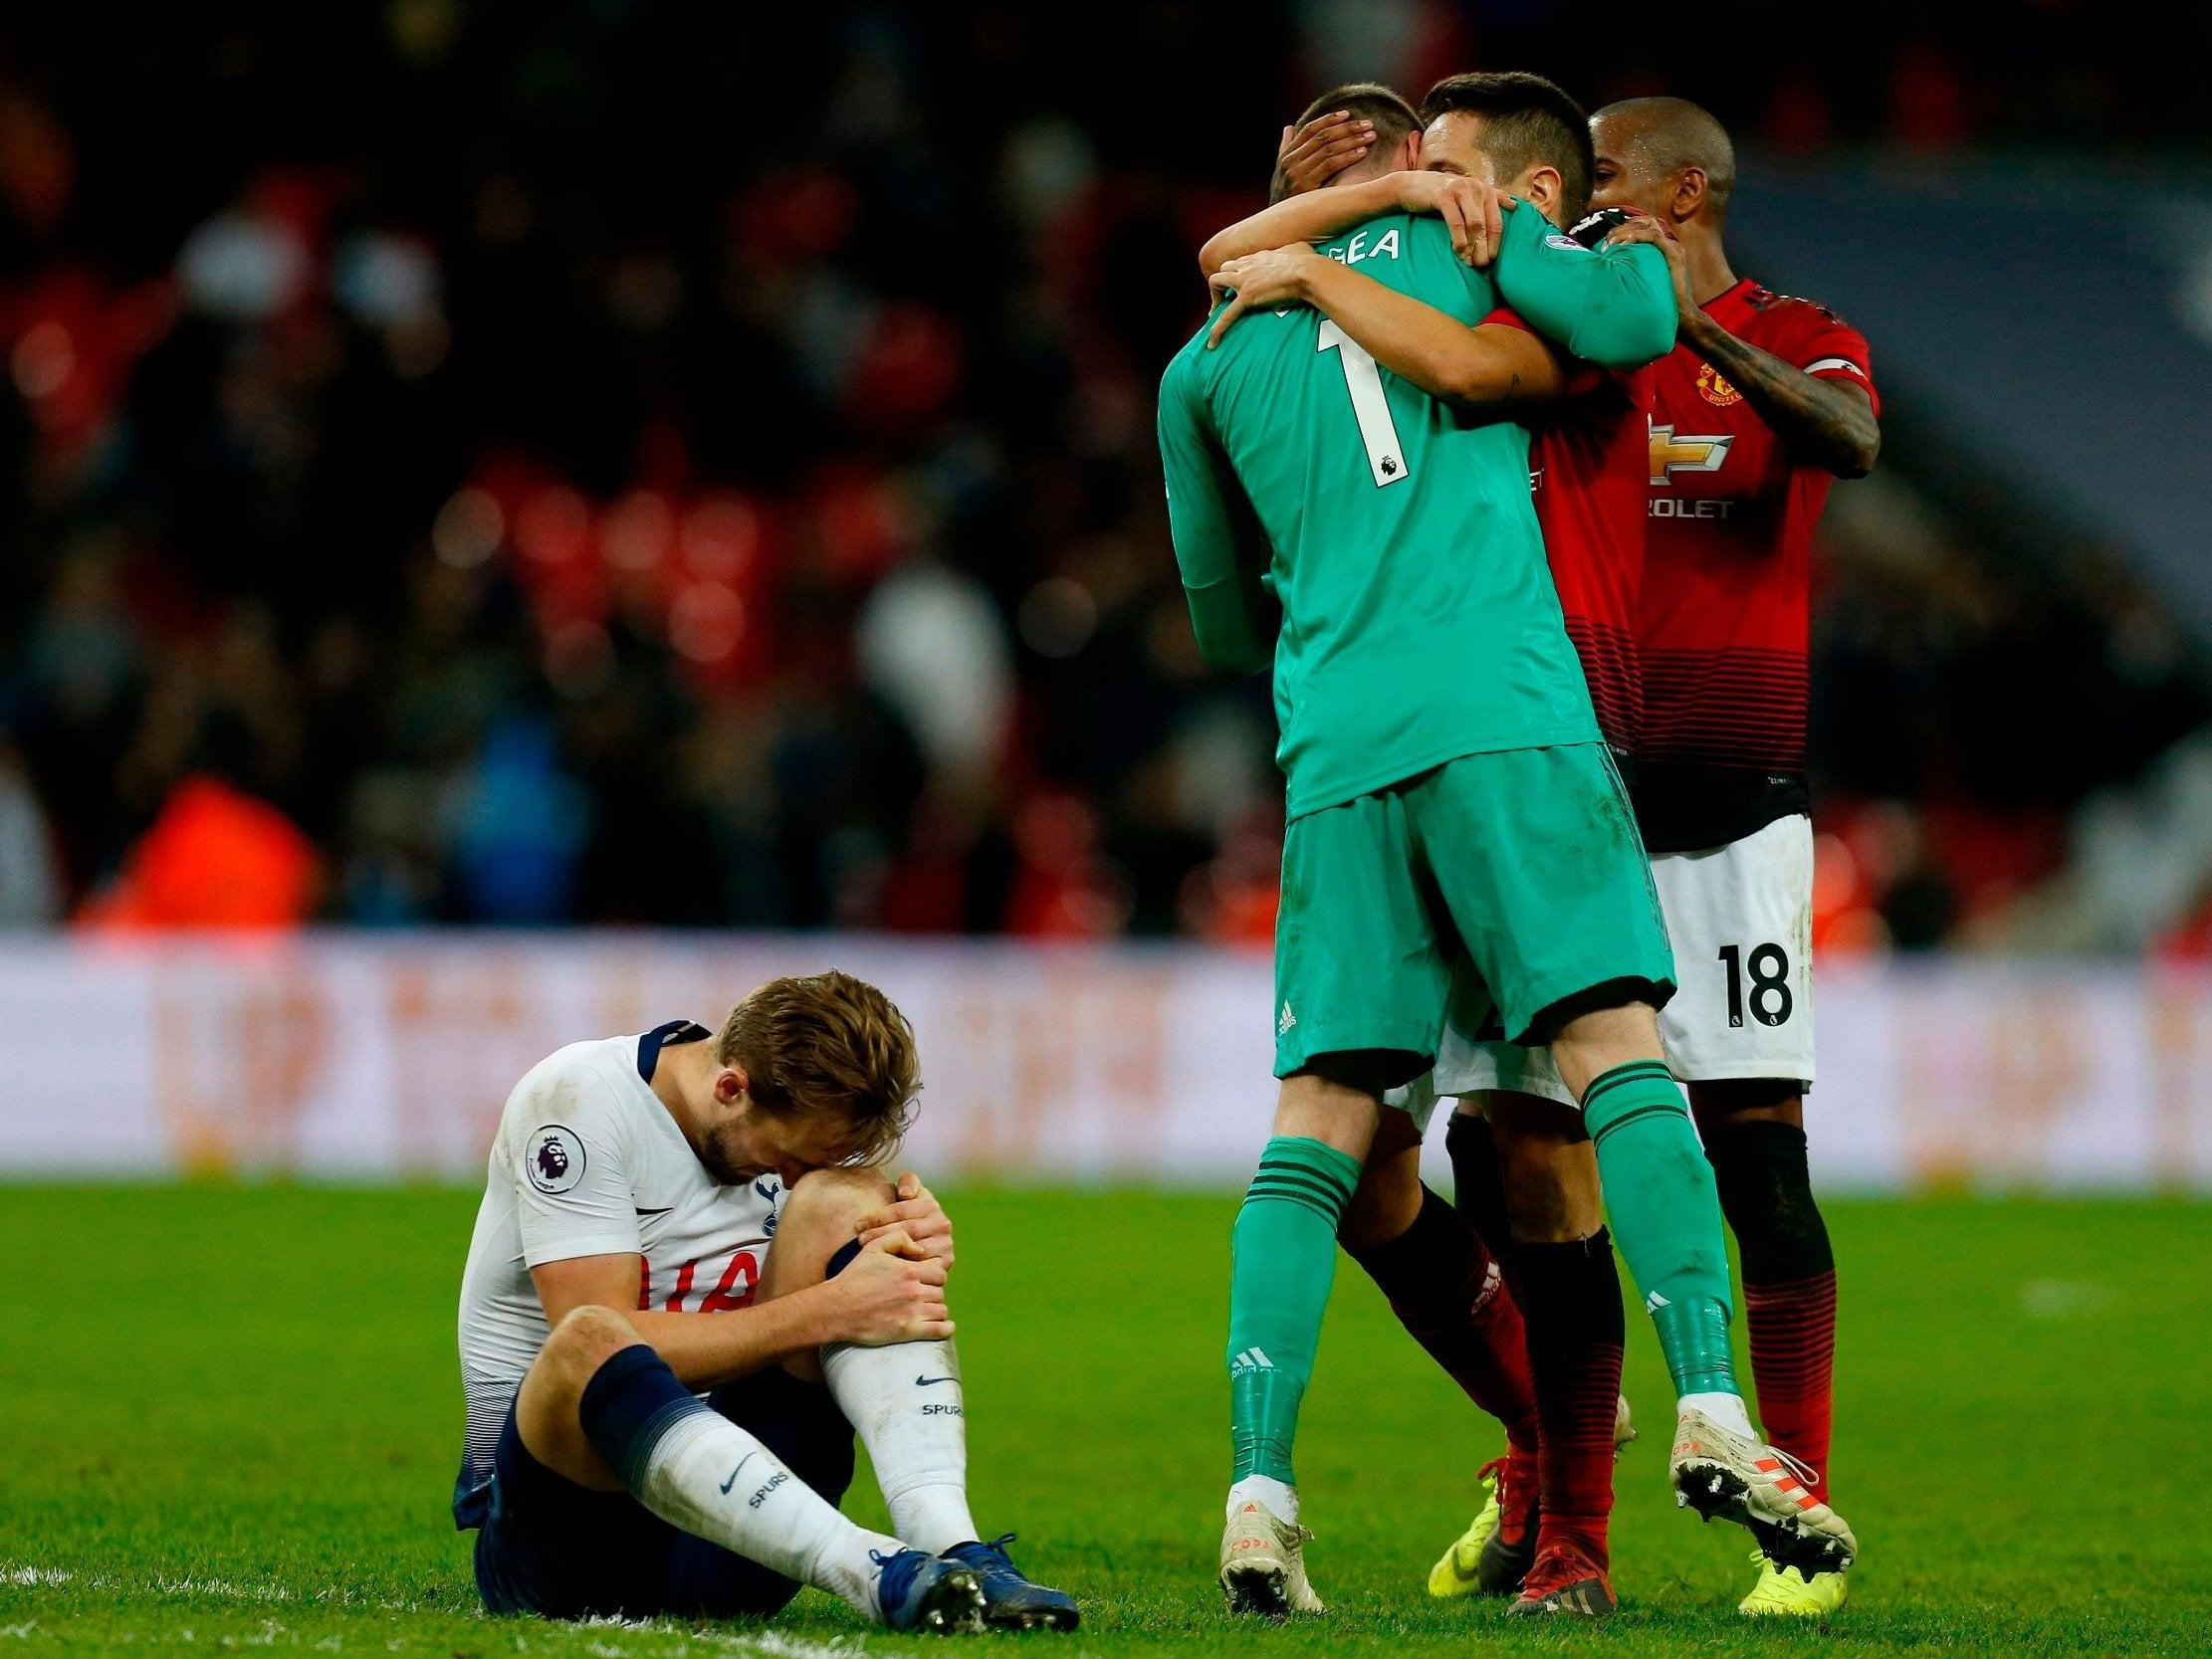 Tottenham vs Manchester United: Spurs gave everything but ...